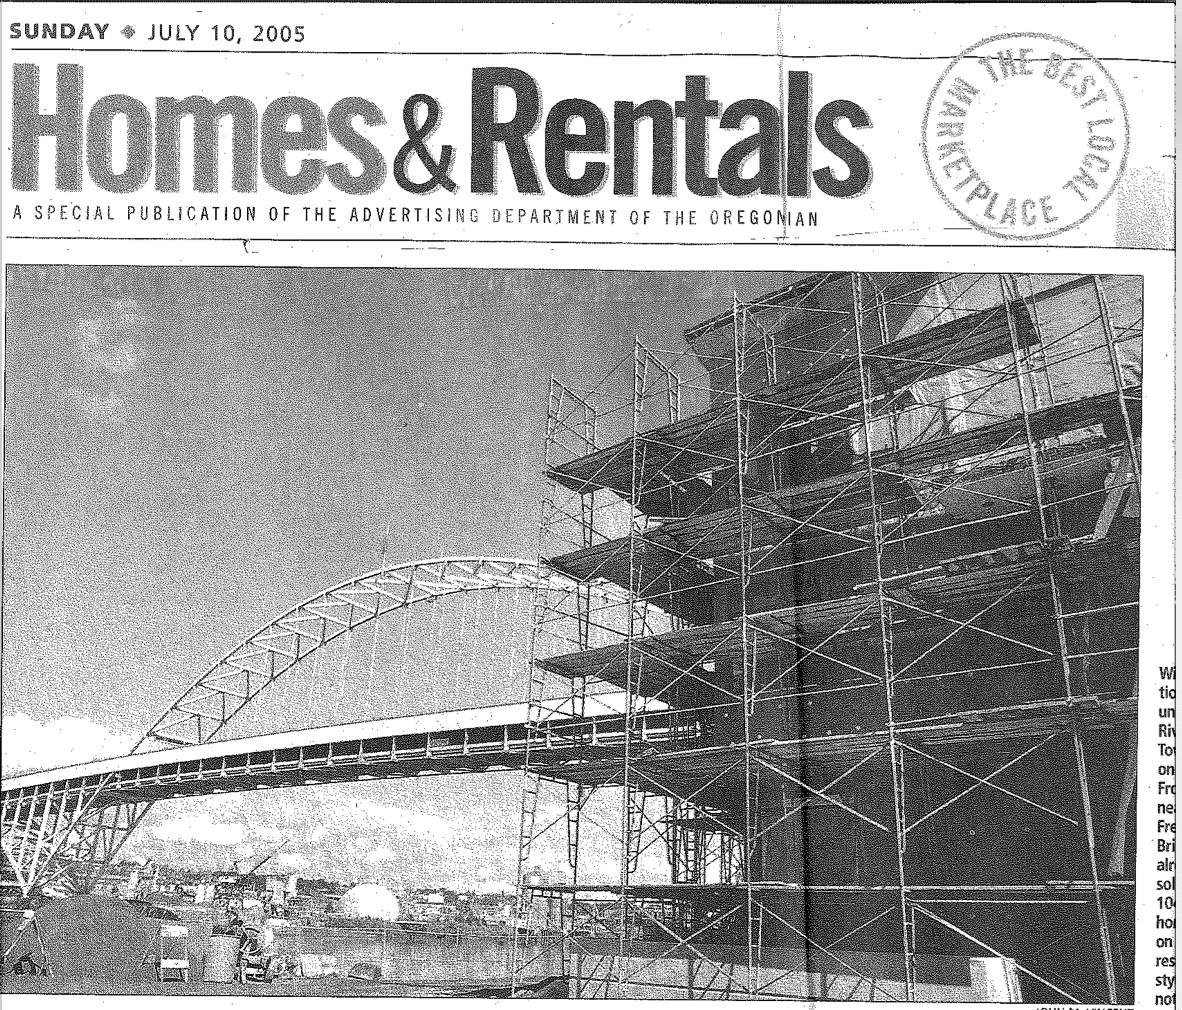 PRESS-SOWA-Waterfront-Condo-Wave-Homes-Rental-Oregonian-07-10-2005